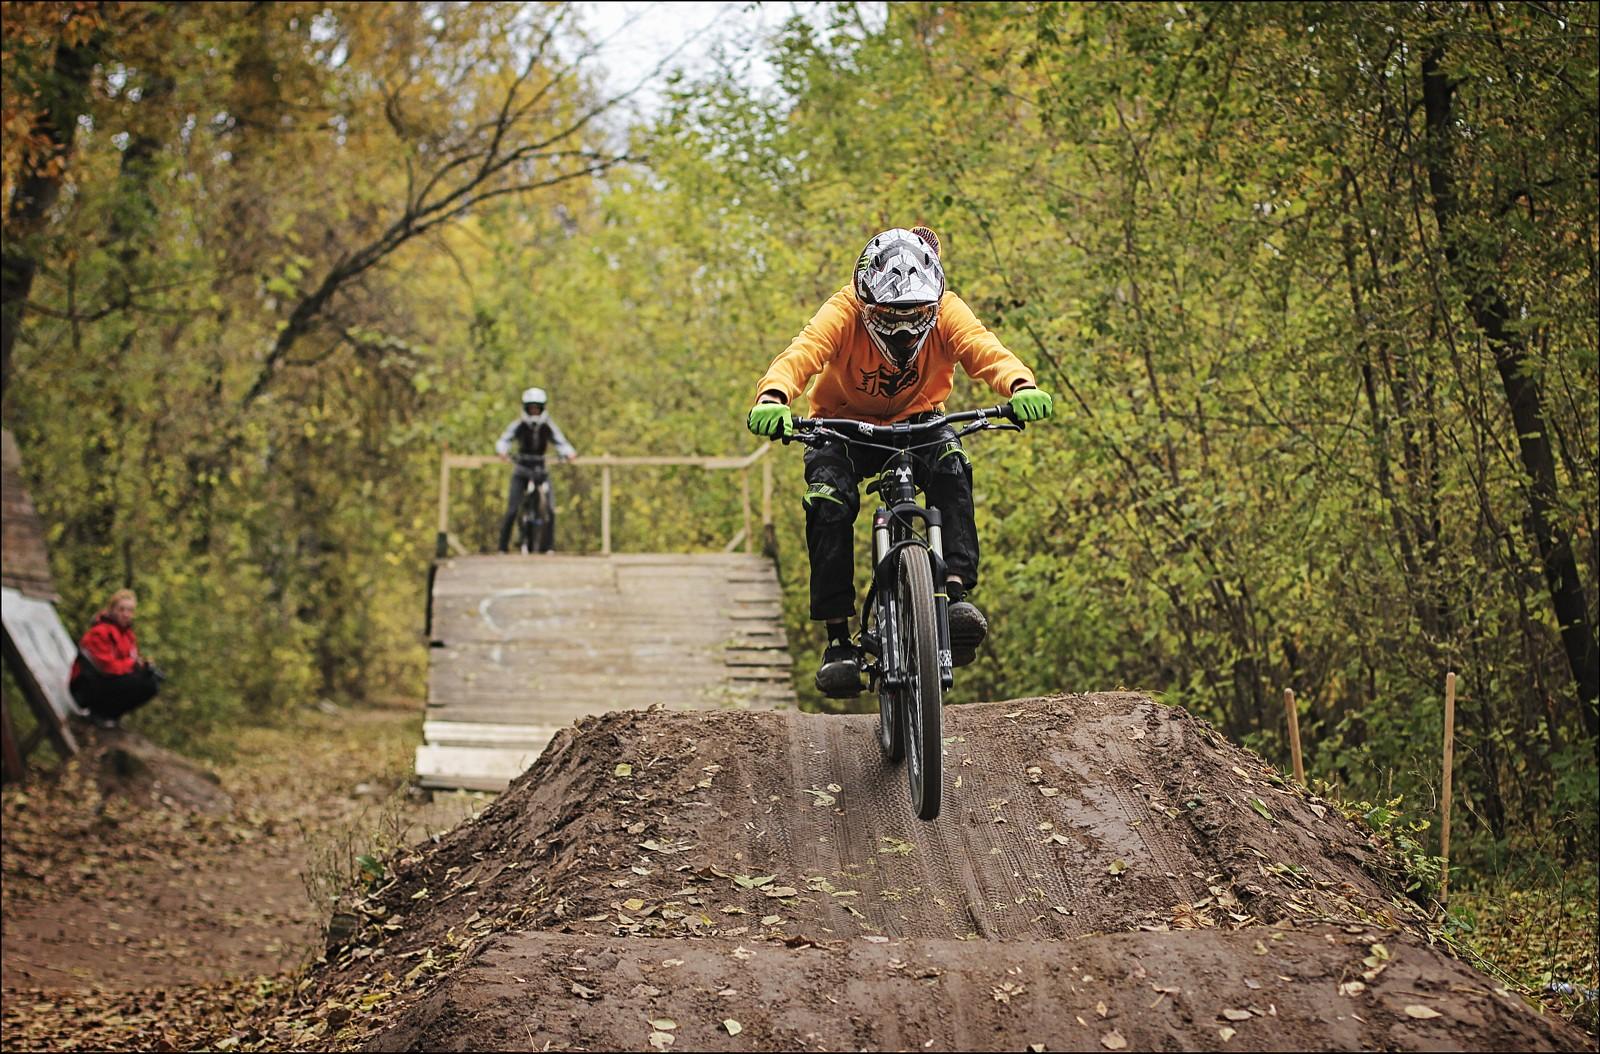 IMG 5083 - YakuT - Mountain Biking Pictures - Vital MTB